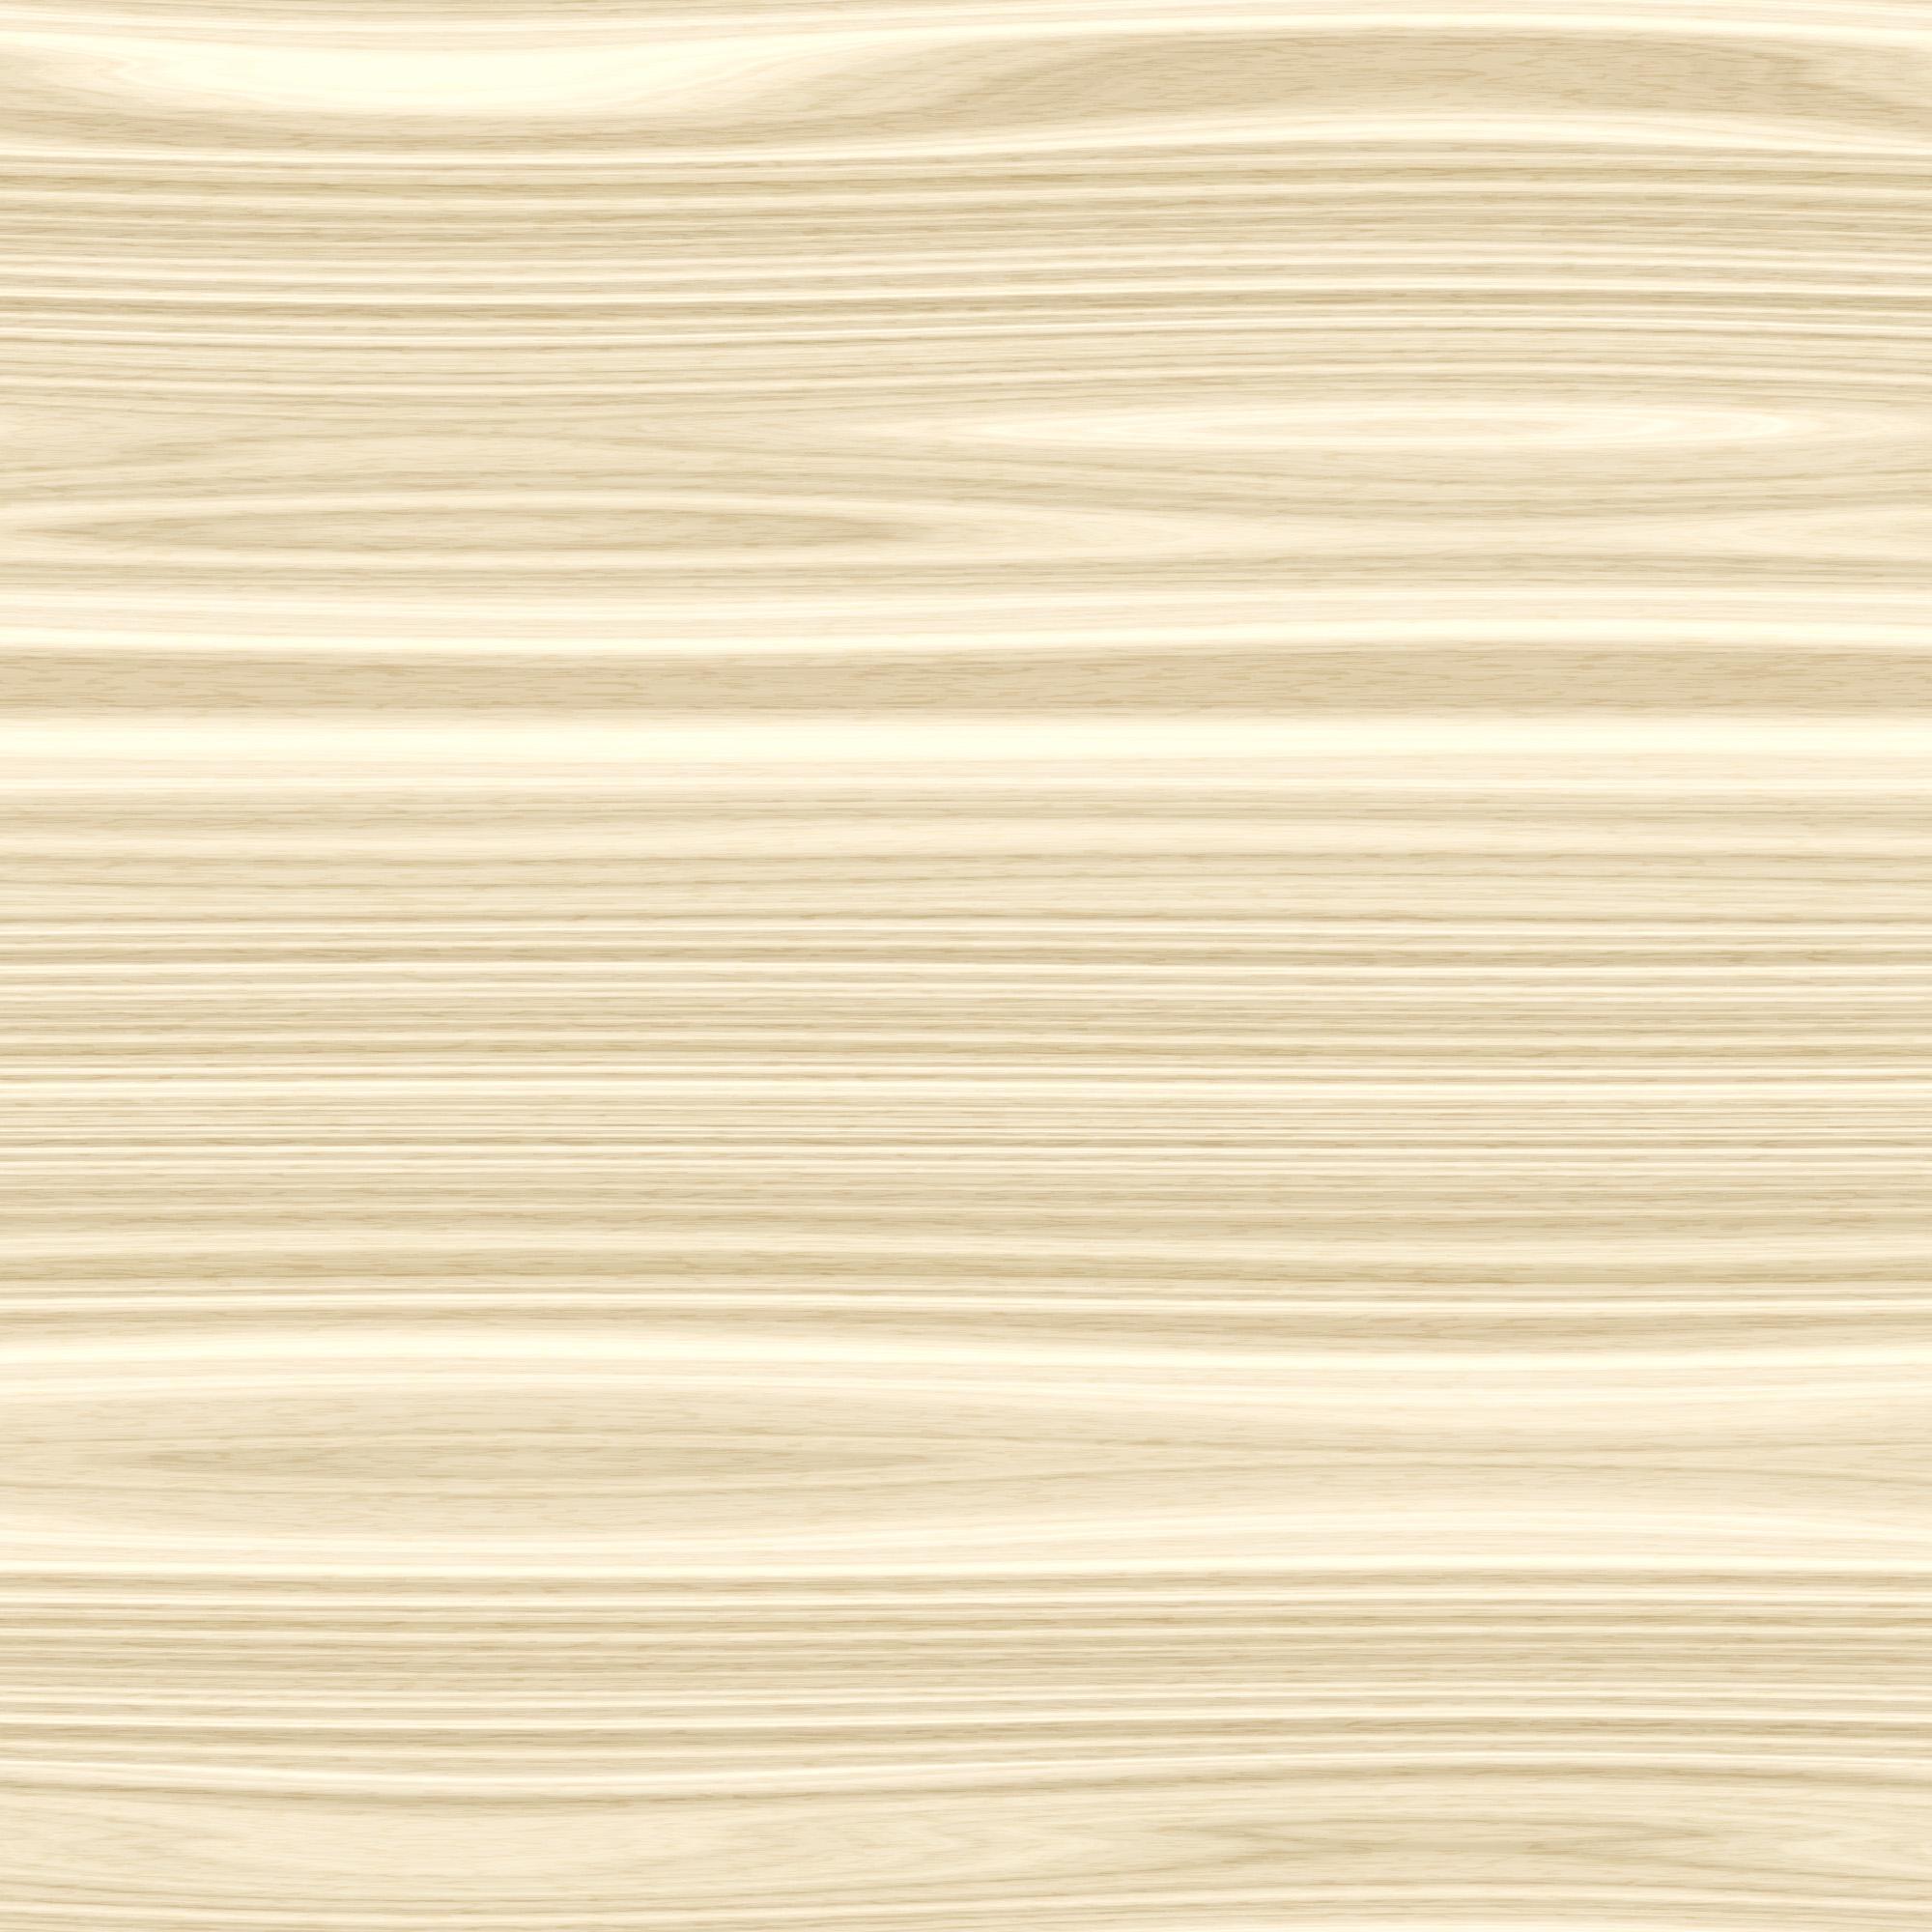 White Background Seamless Wood Texture Www